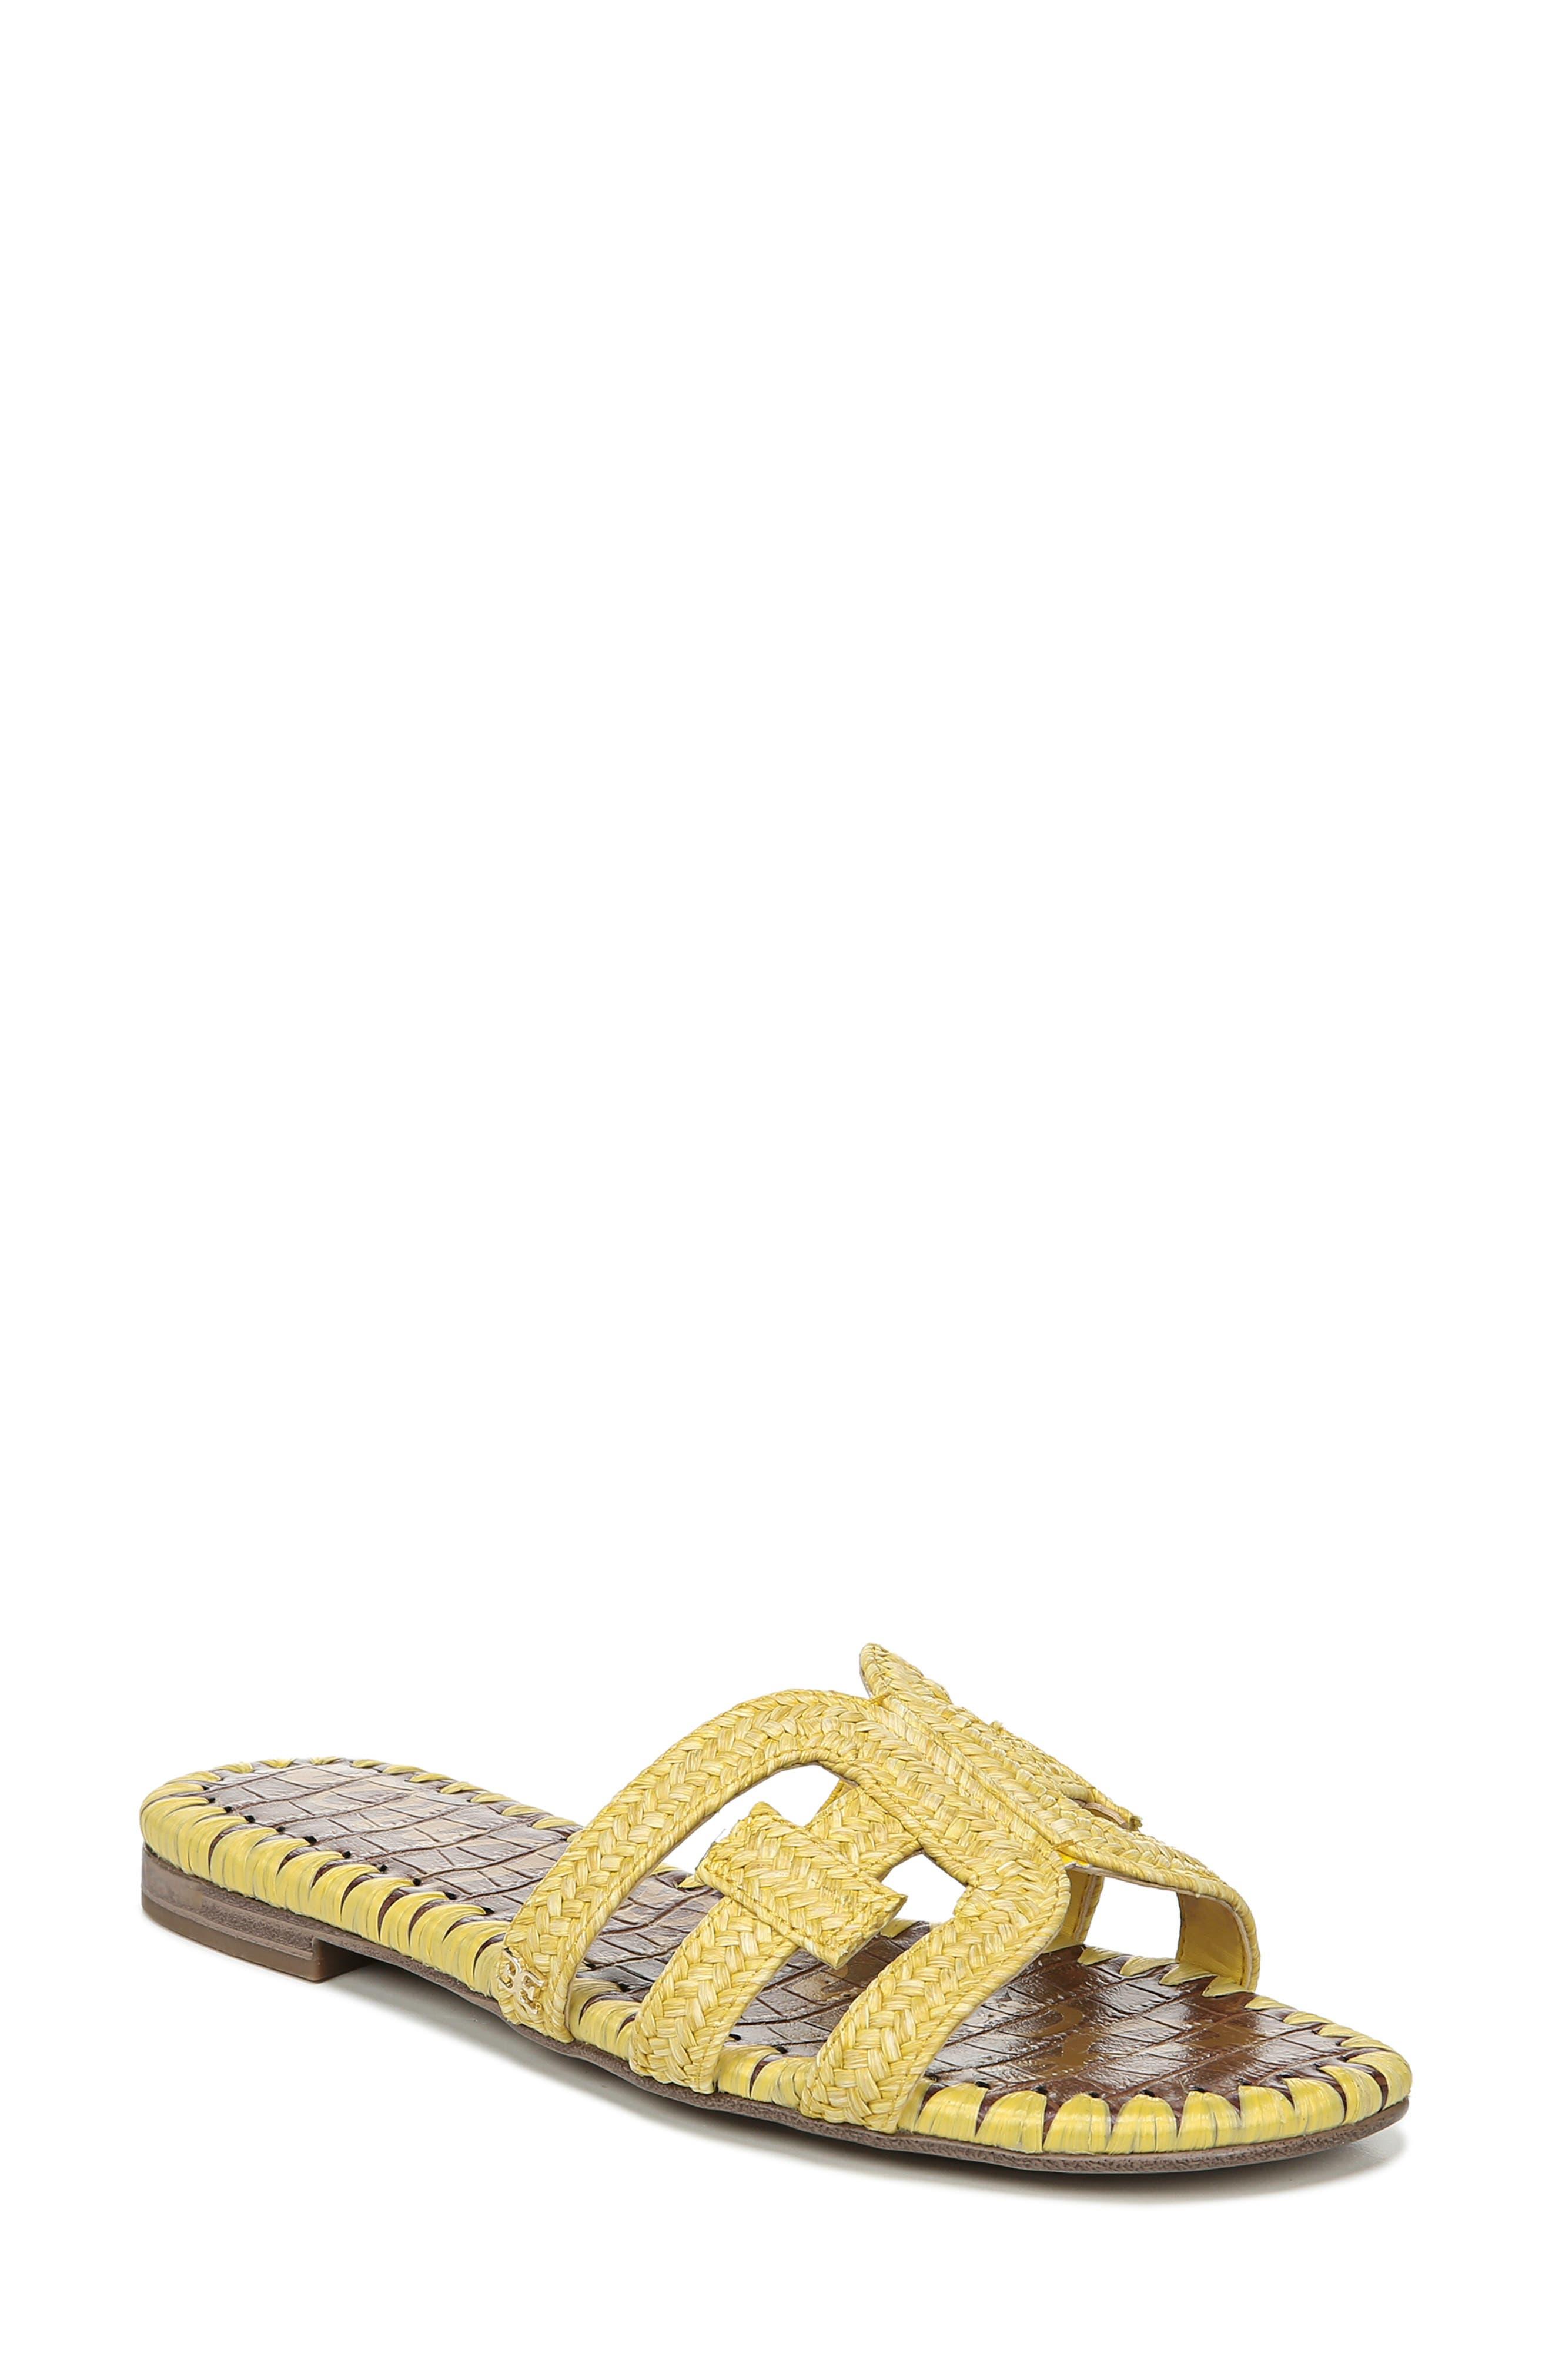 Sam Edelman Beckie Slide Sandal- Yellow